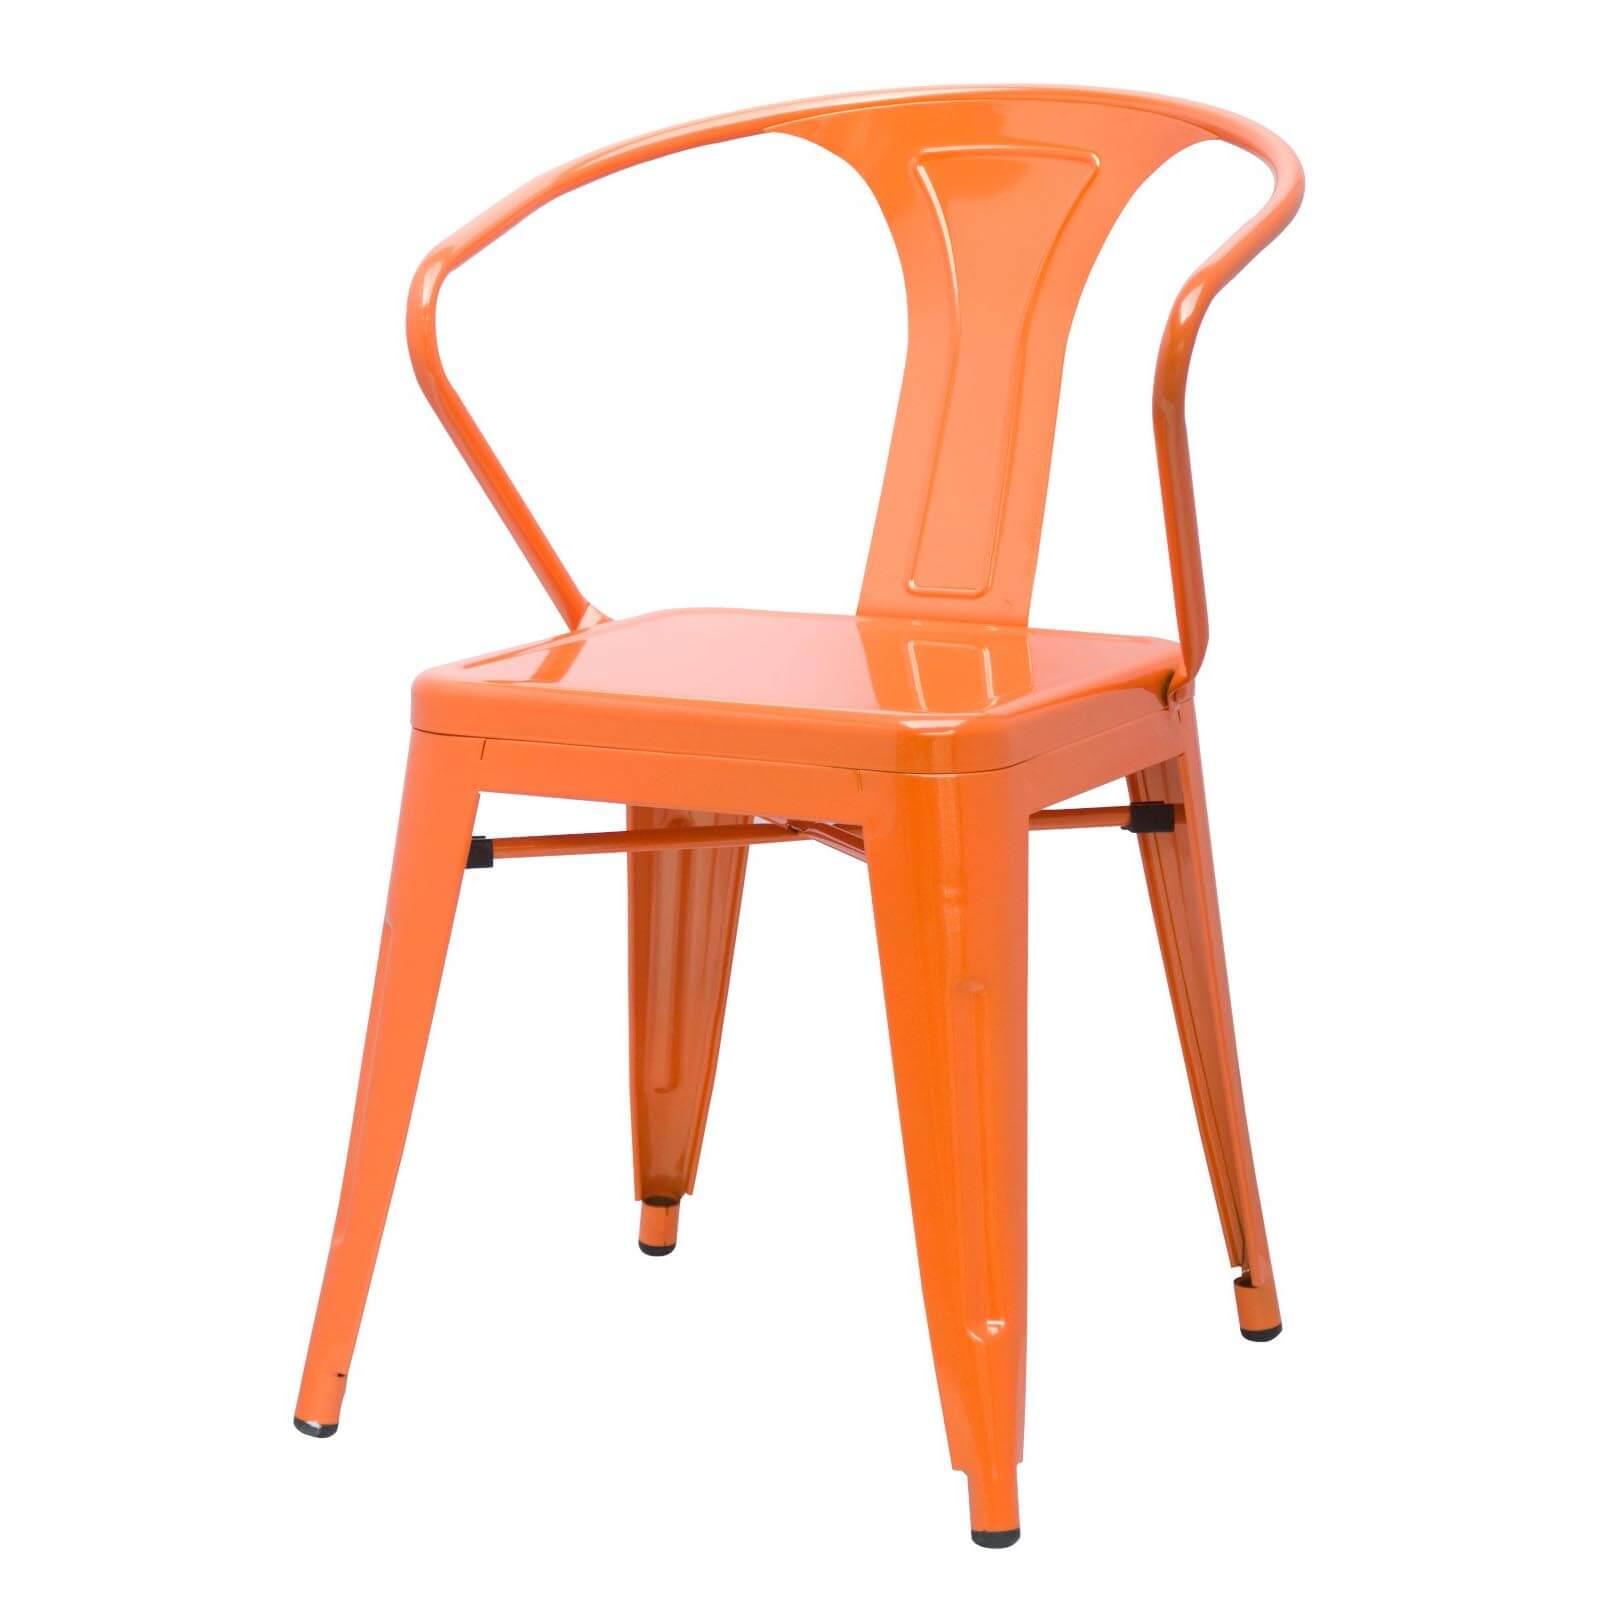 Metropolis Metal Arm Chair Distressed Yellow Paint Drops Set of